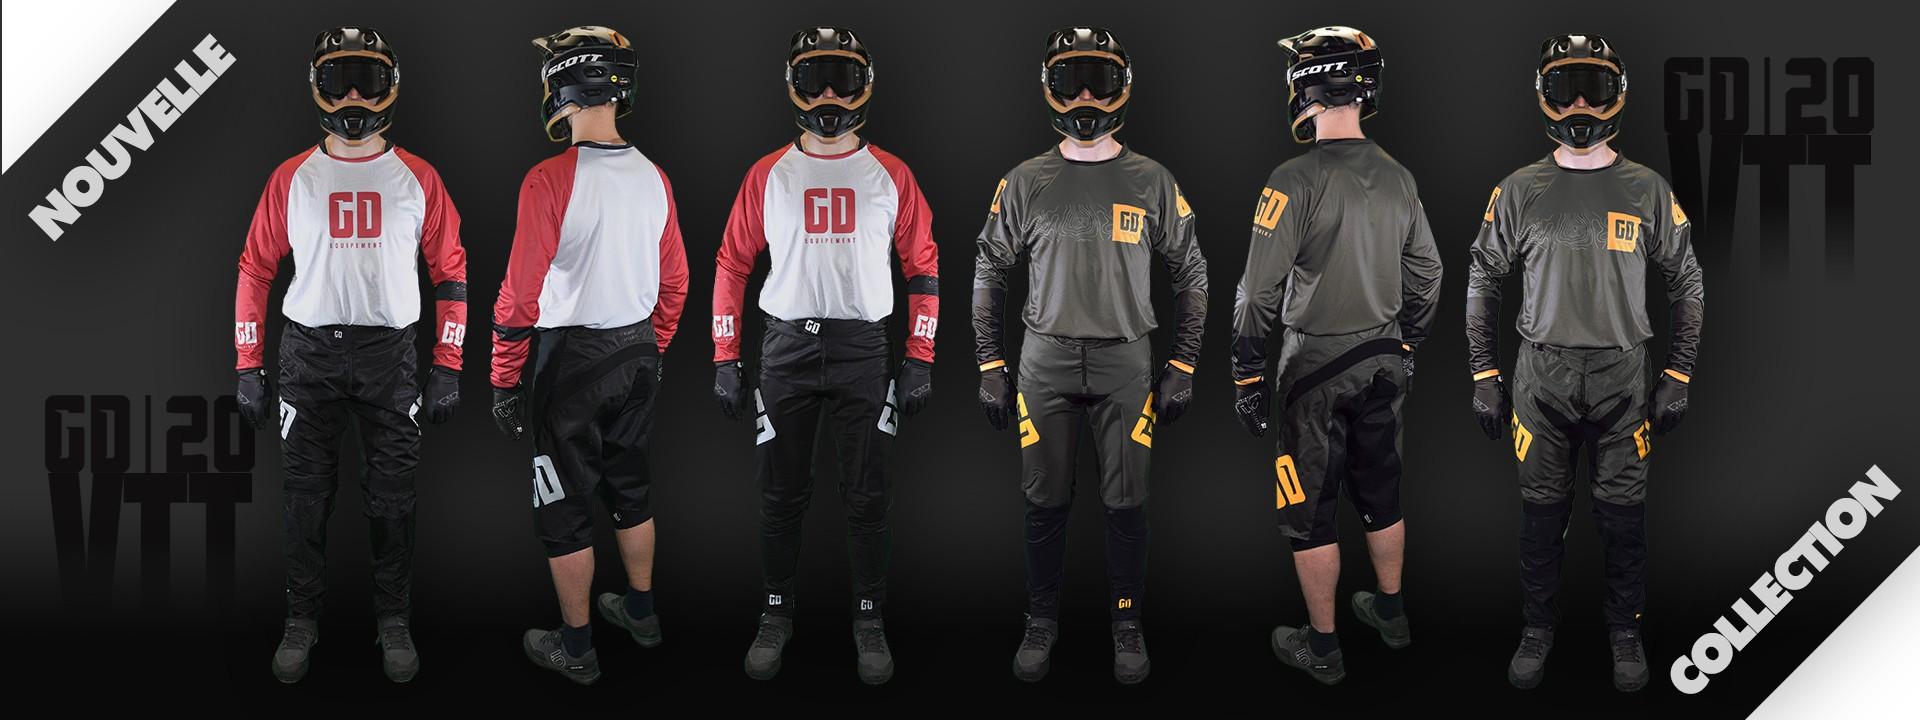 Tenue VTT enduro - DH - BMX - MTB : shorts - pantalon - maillot - gants